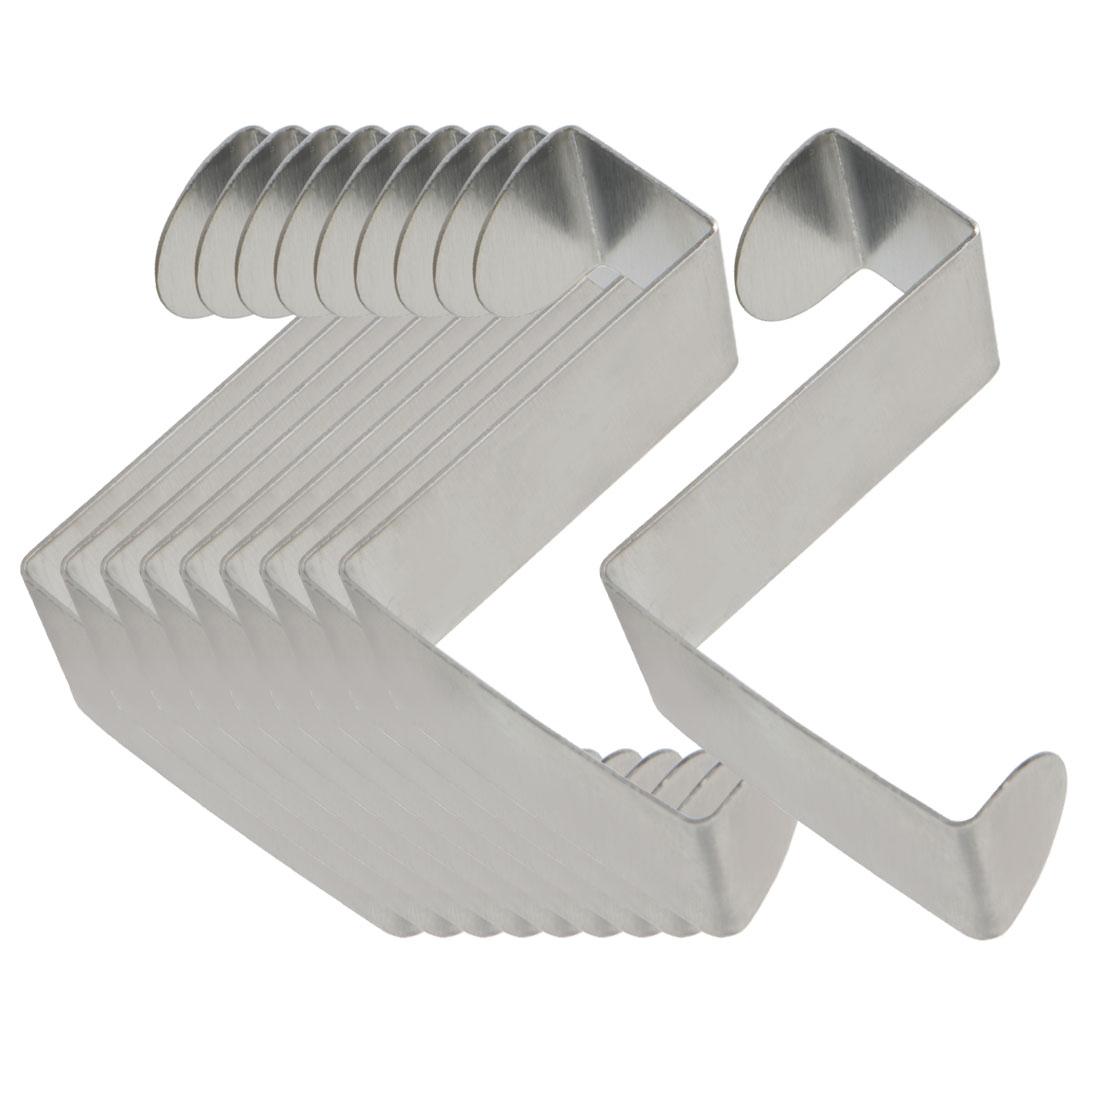 10pcs Z Shaped Hook Stainless Steel for Kitchenware Pot Utensils Coat Holders